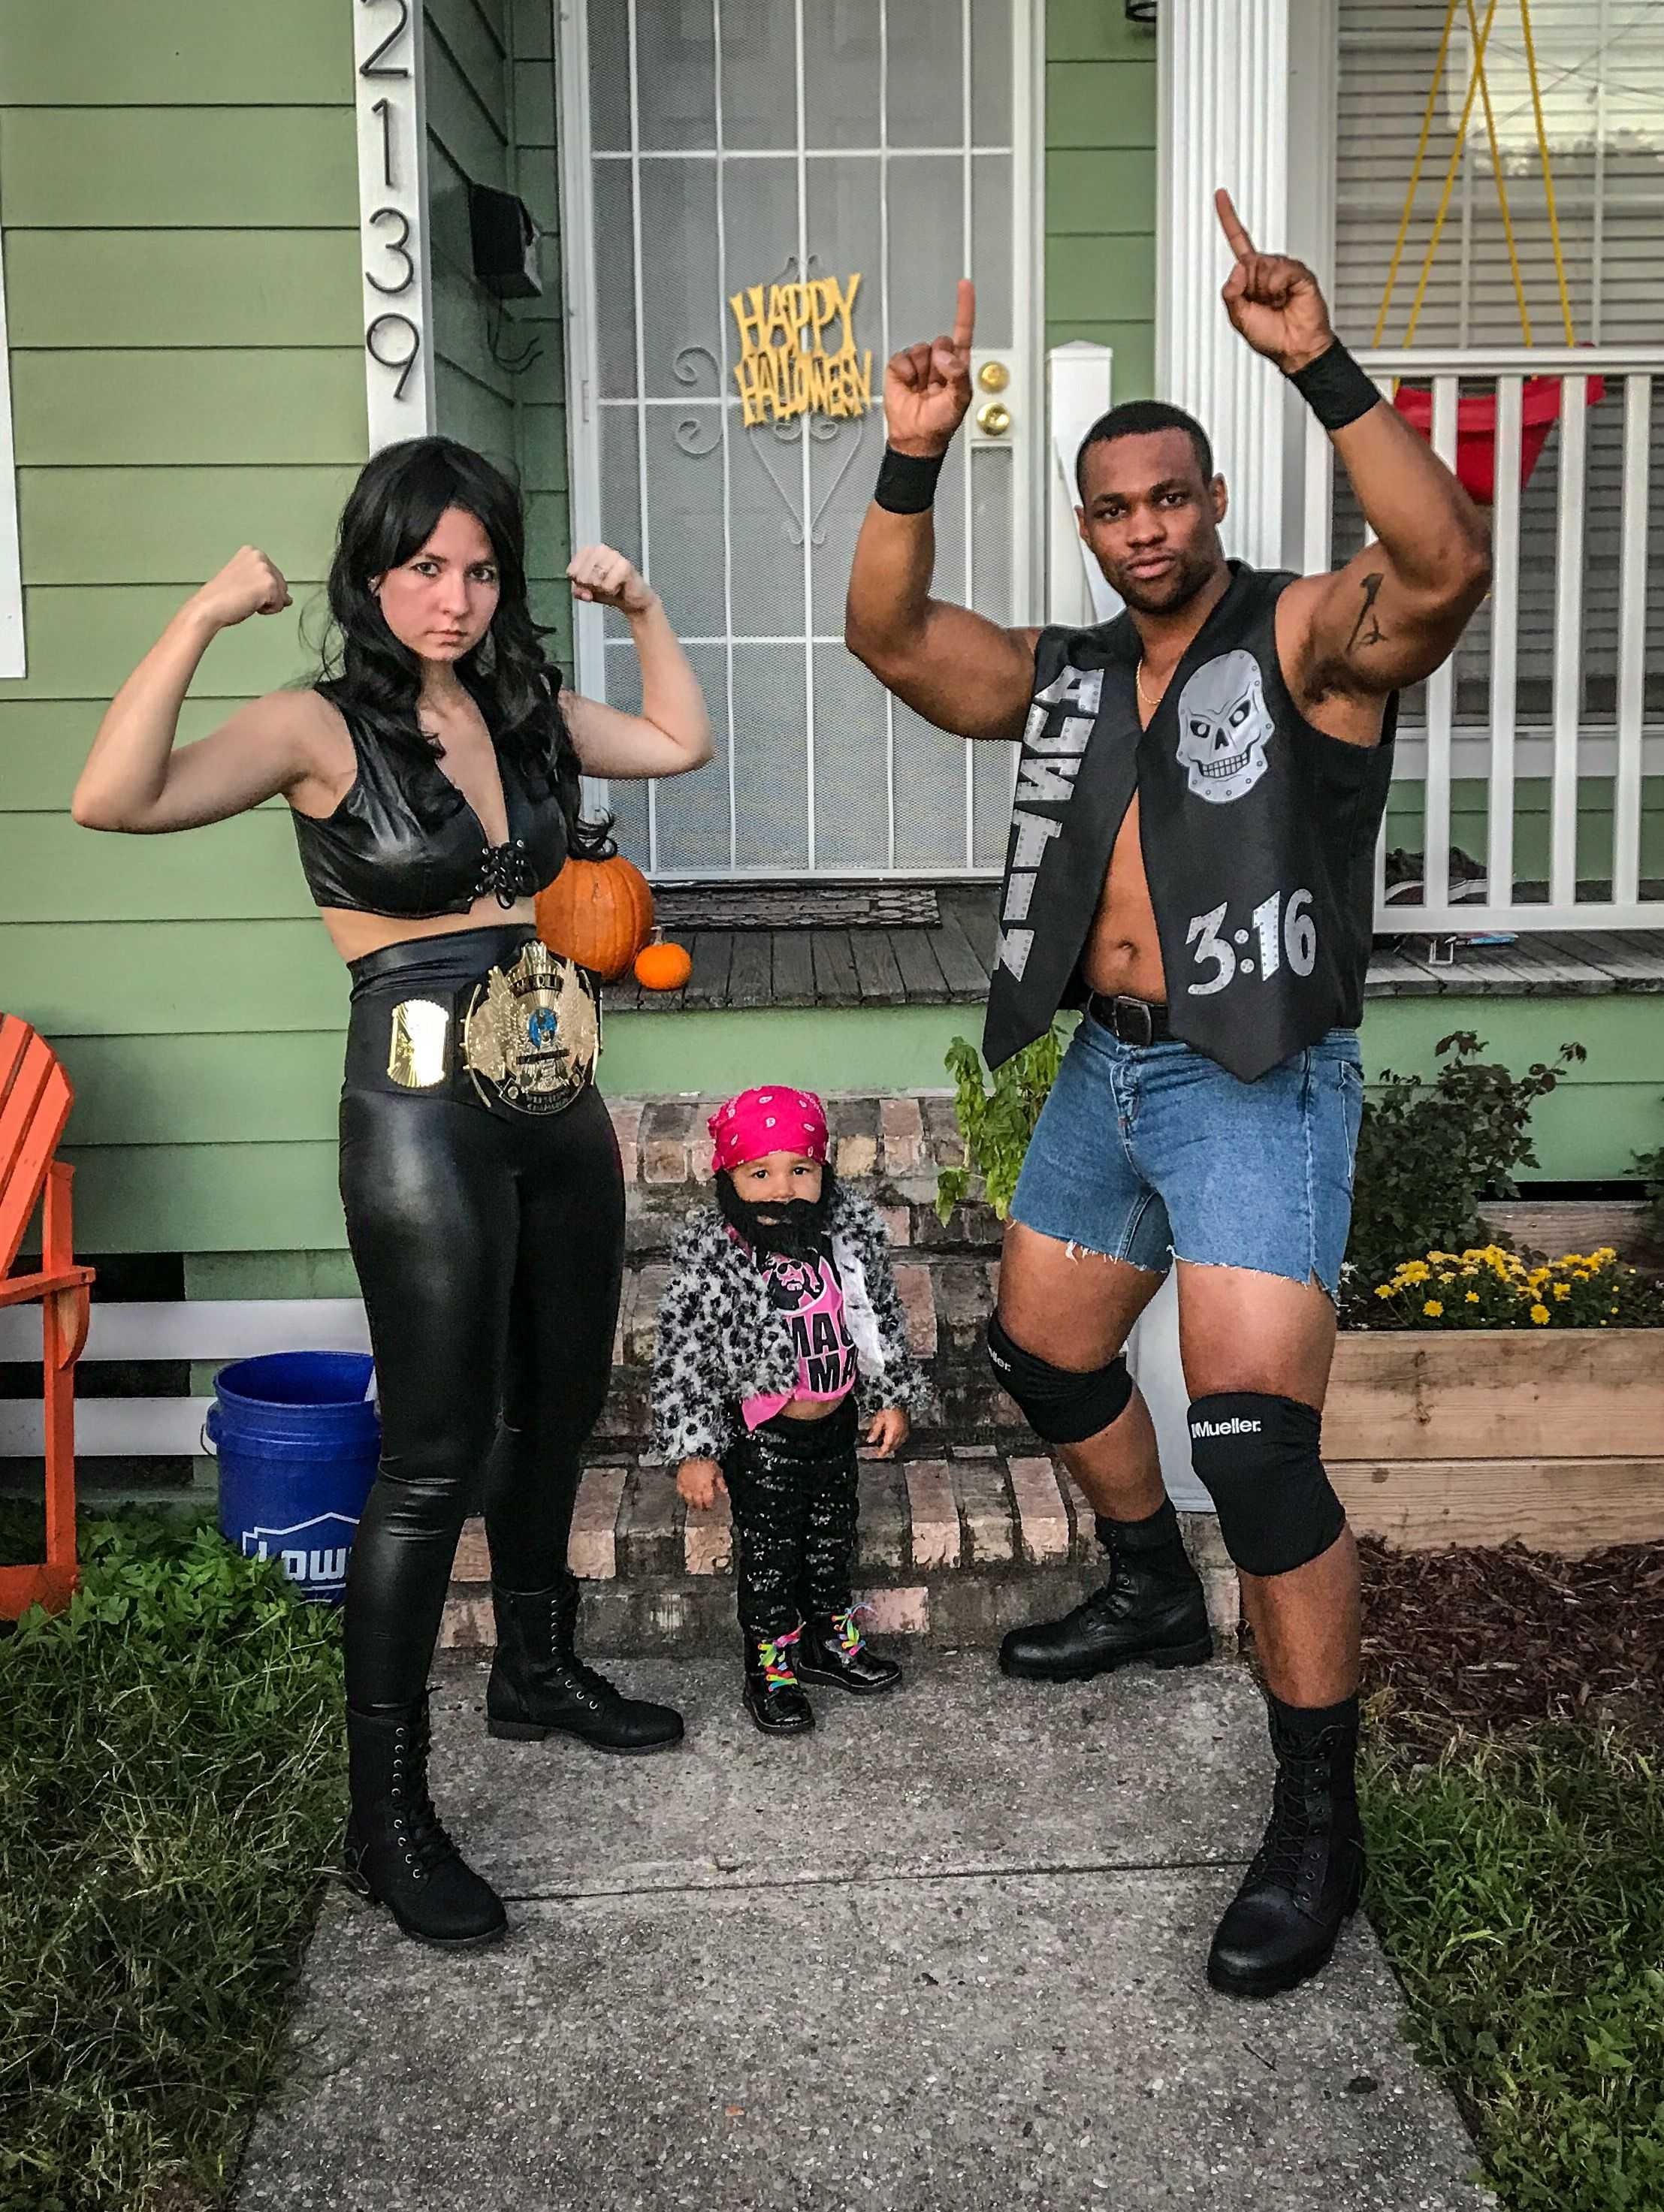 Stone Cold Steve Austin WWE Wrestling Fancy Dress Up Halloween Child Costume